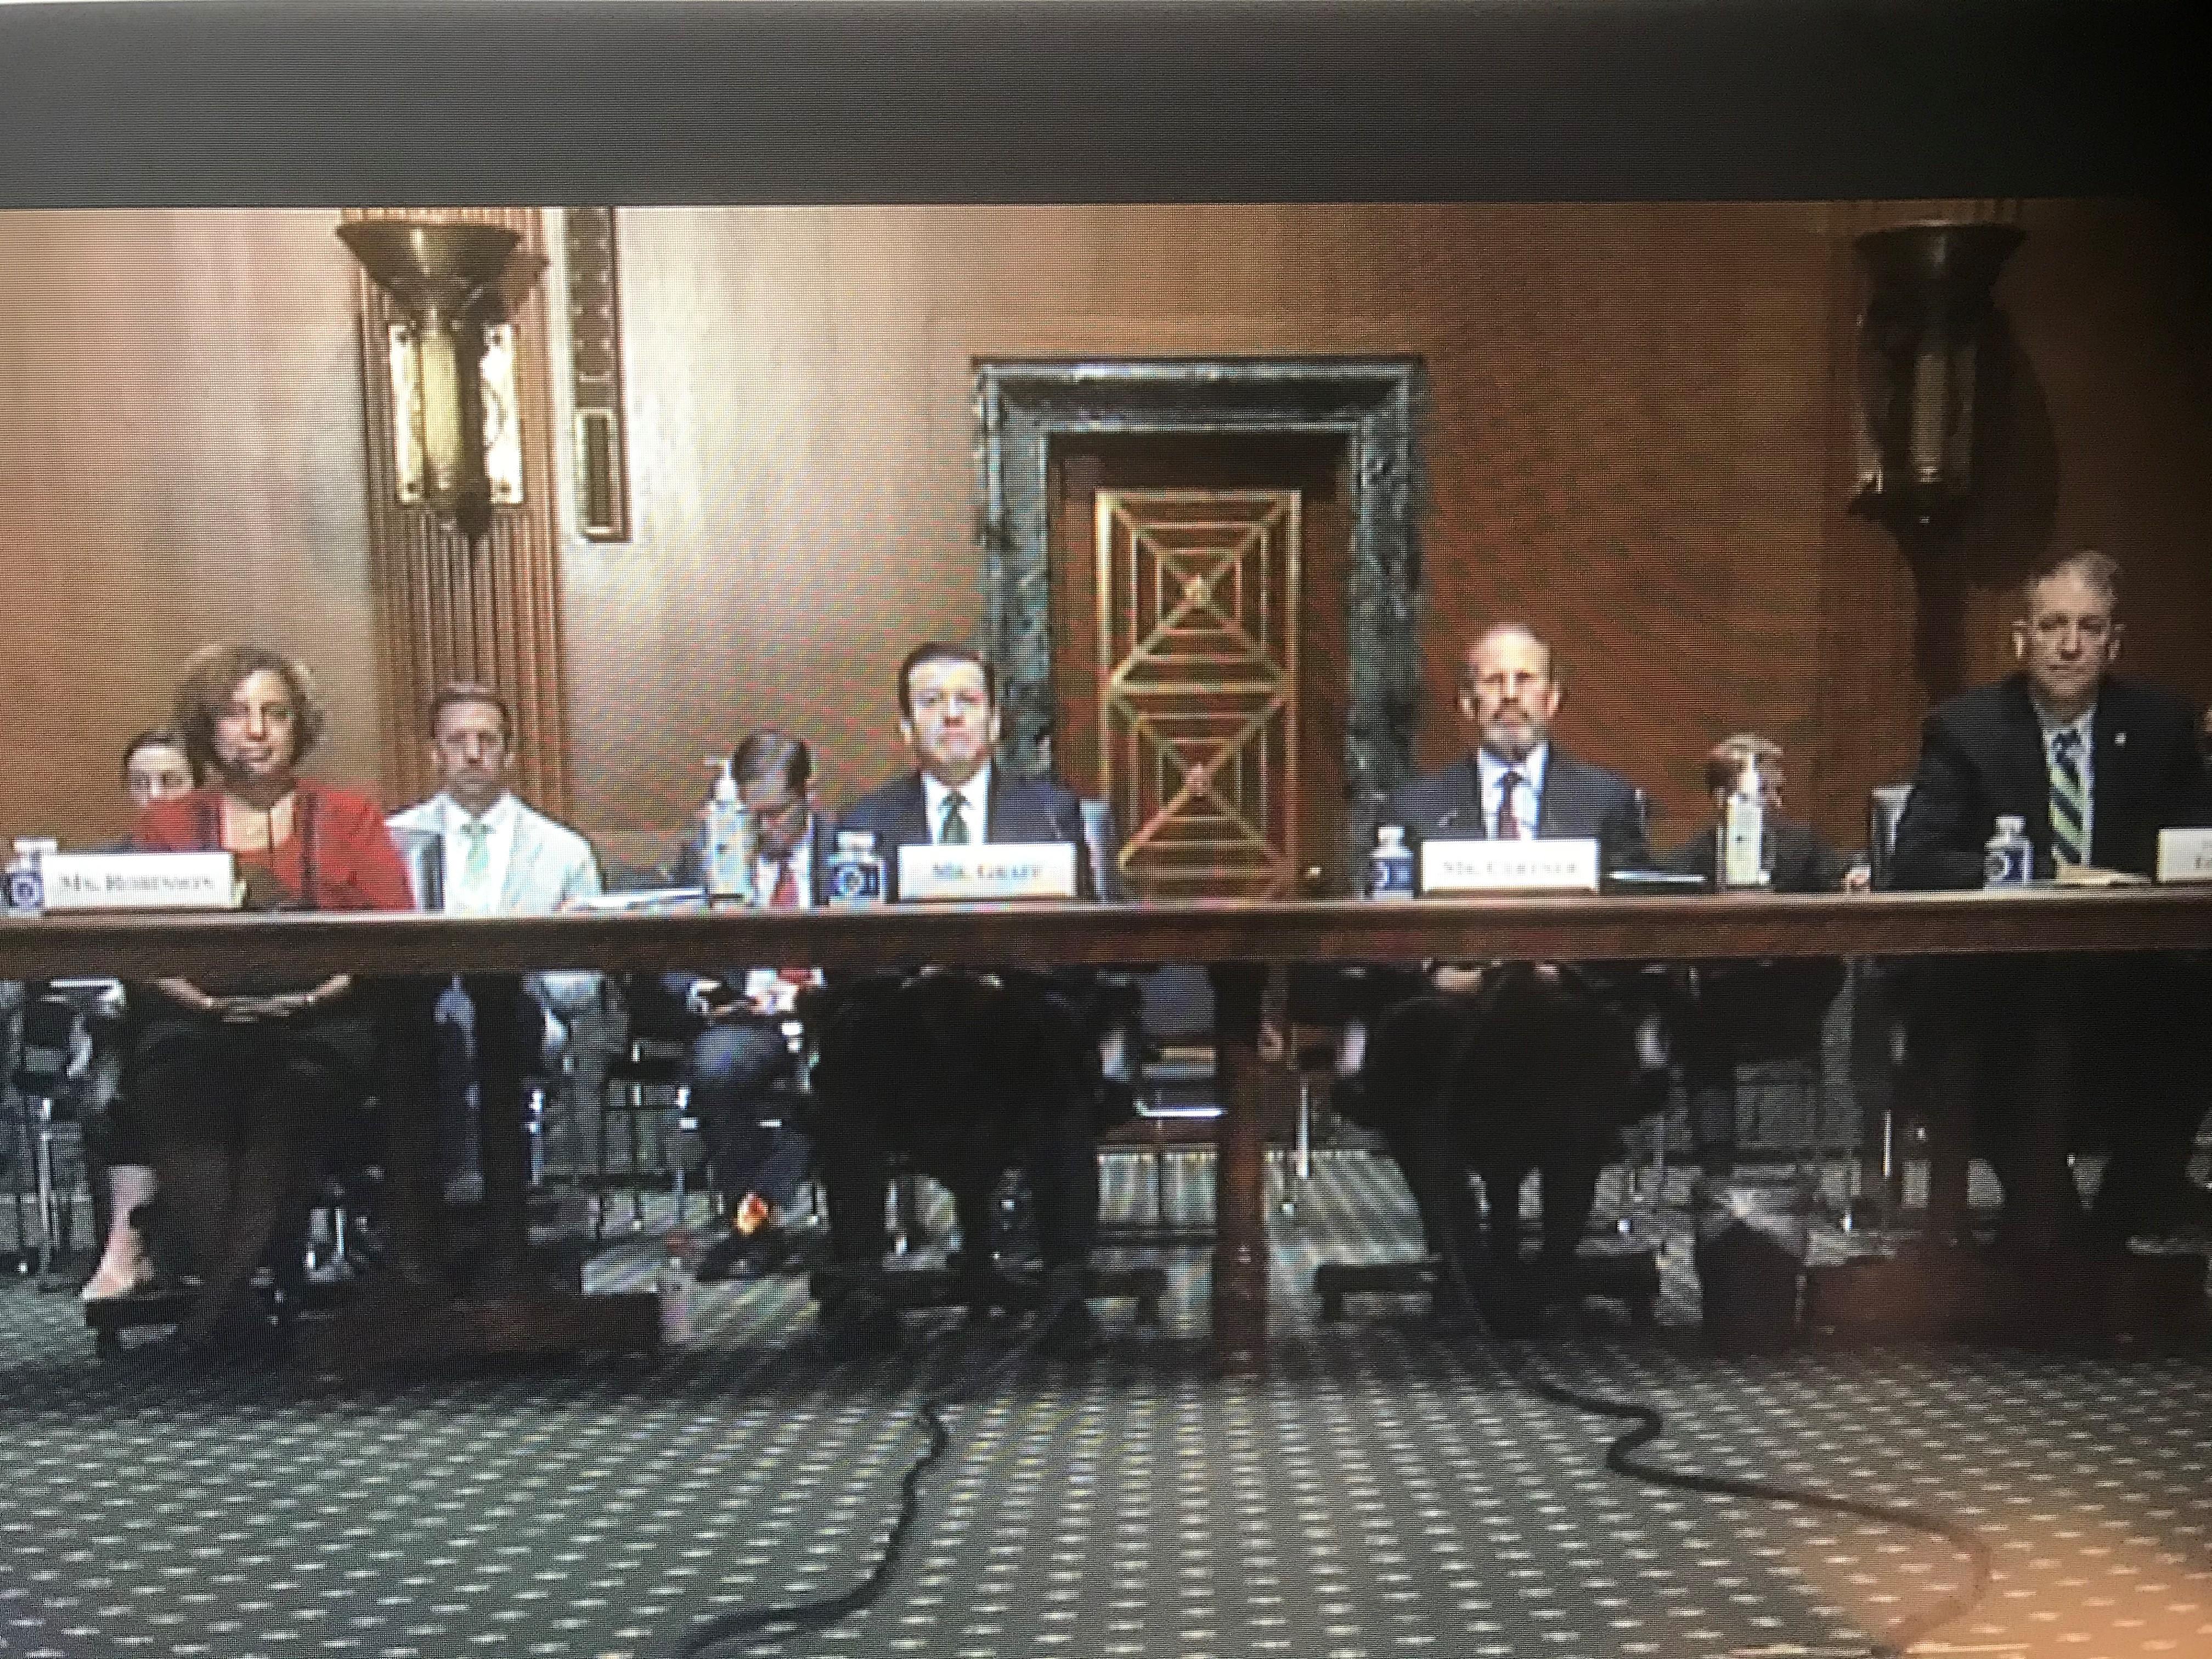 Senate Finance Committee – 401k Hearings